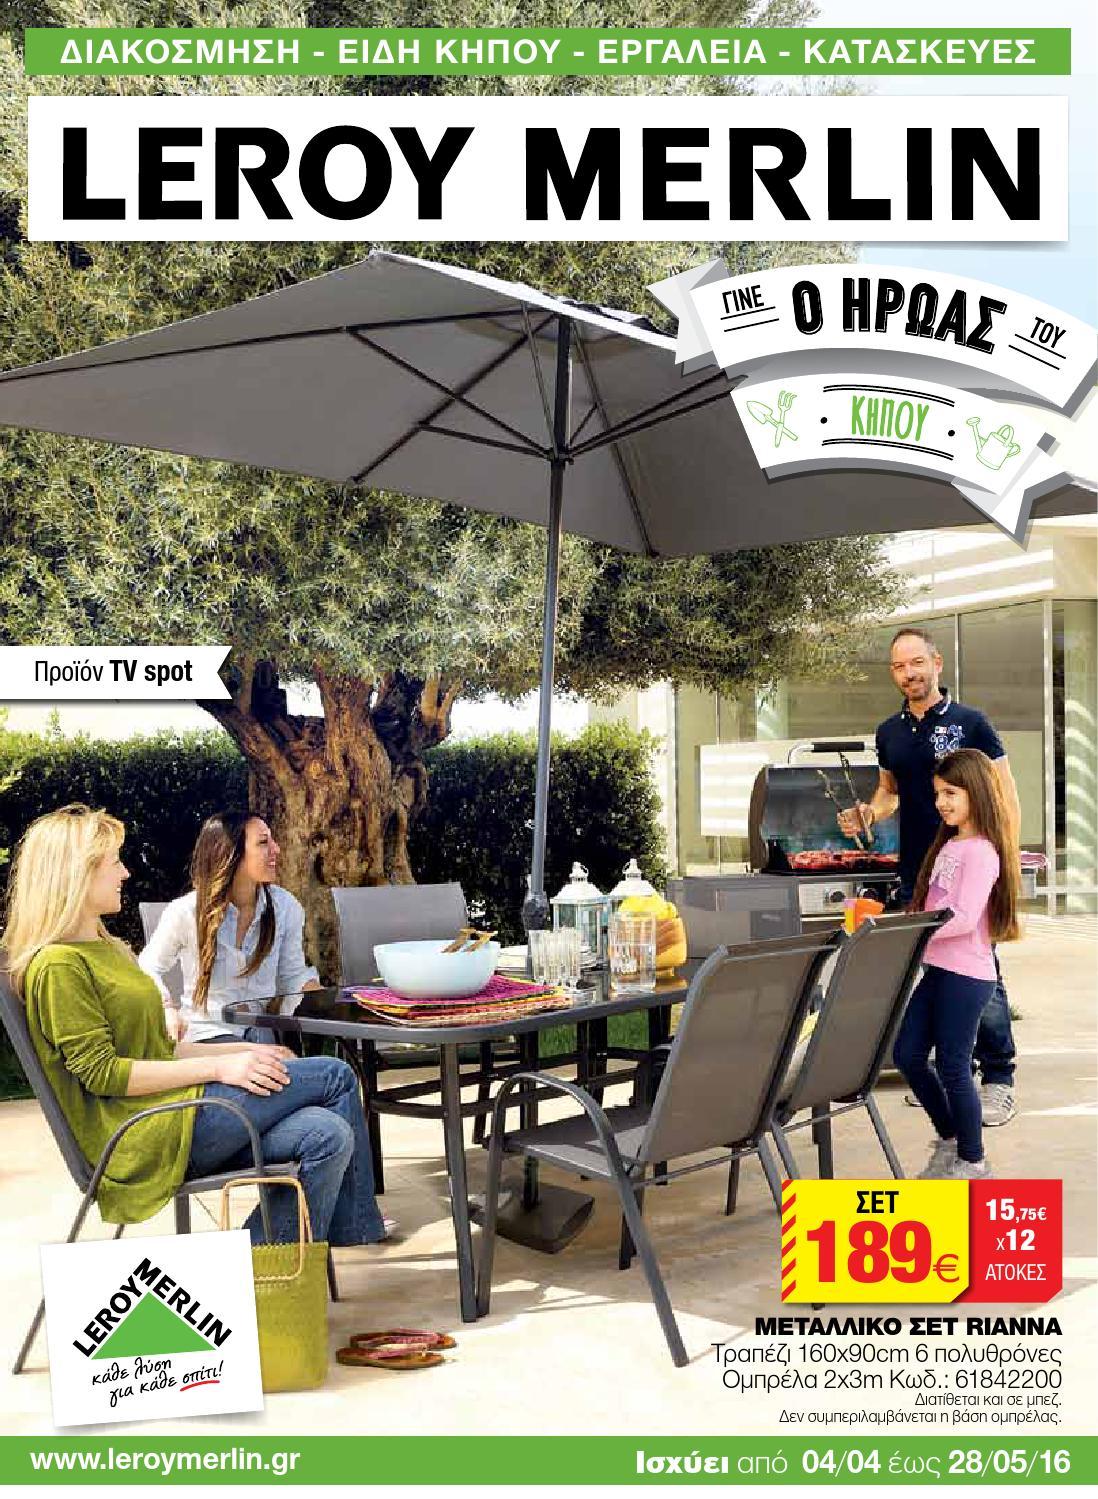 100 plan snack cuisine leroy merlin indogate com accessoire salle de bain leroy merlin - Musique pub leroy merlin ...